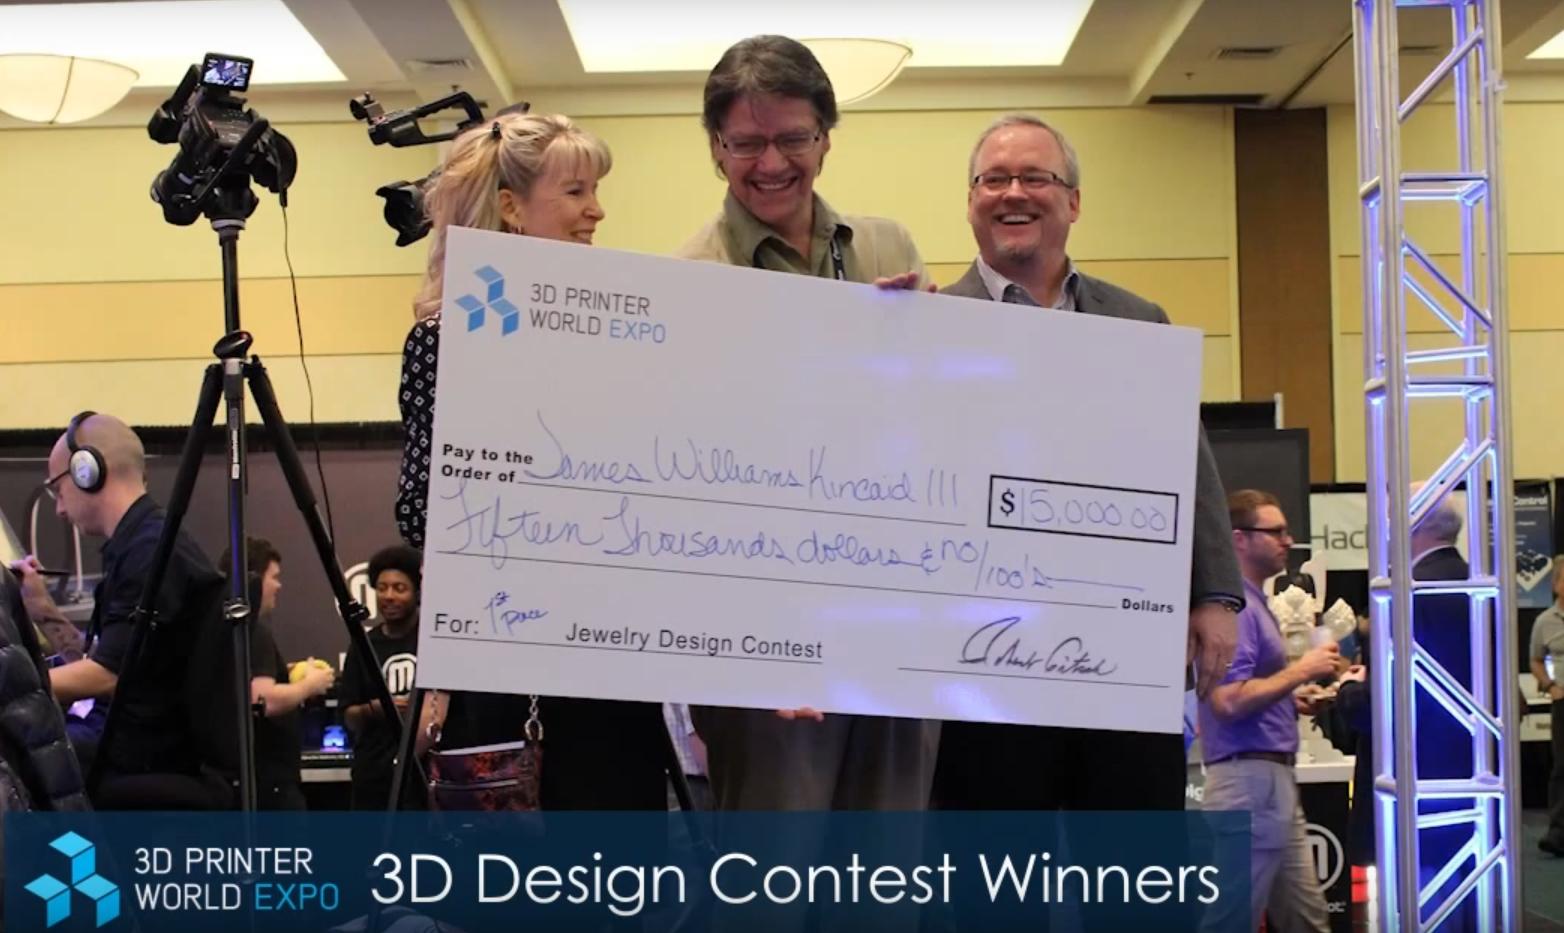 3D Printer World Expo win croped.jpg